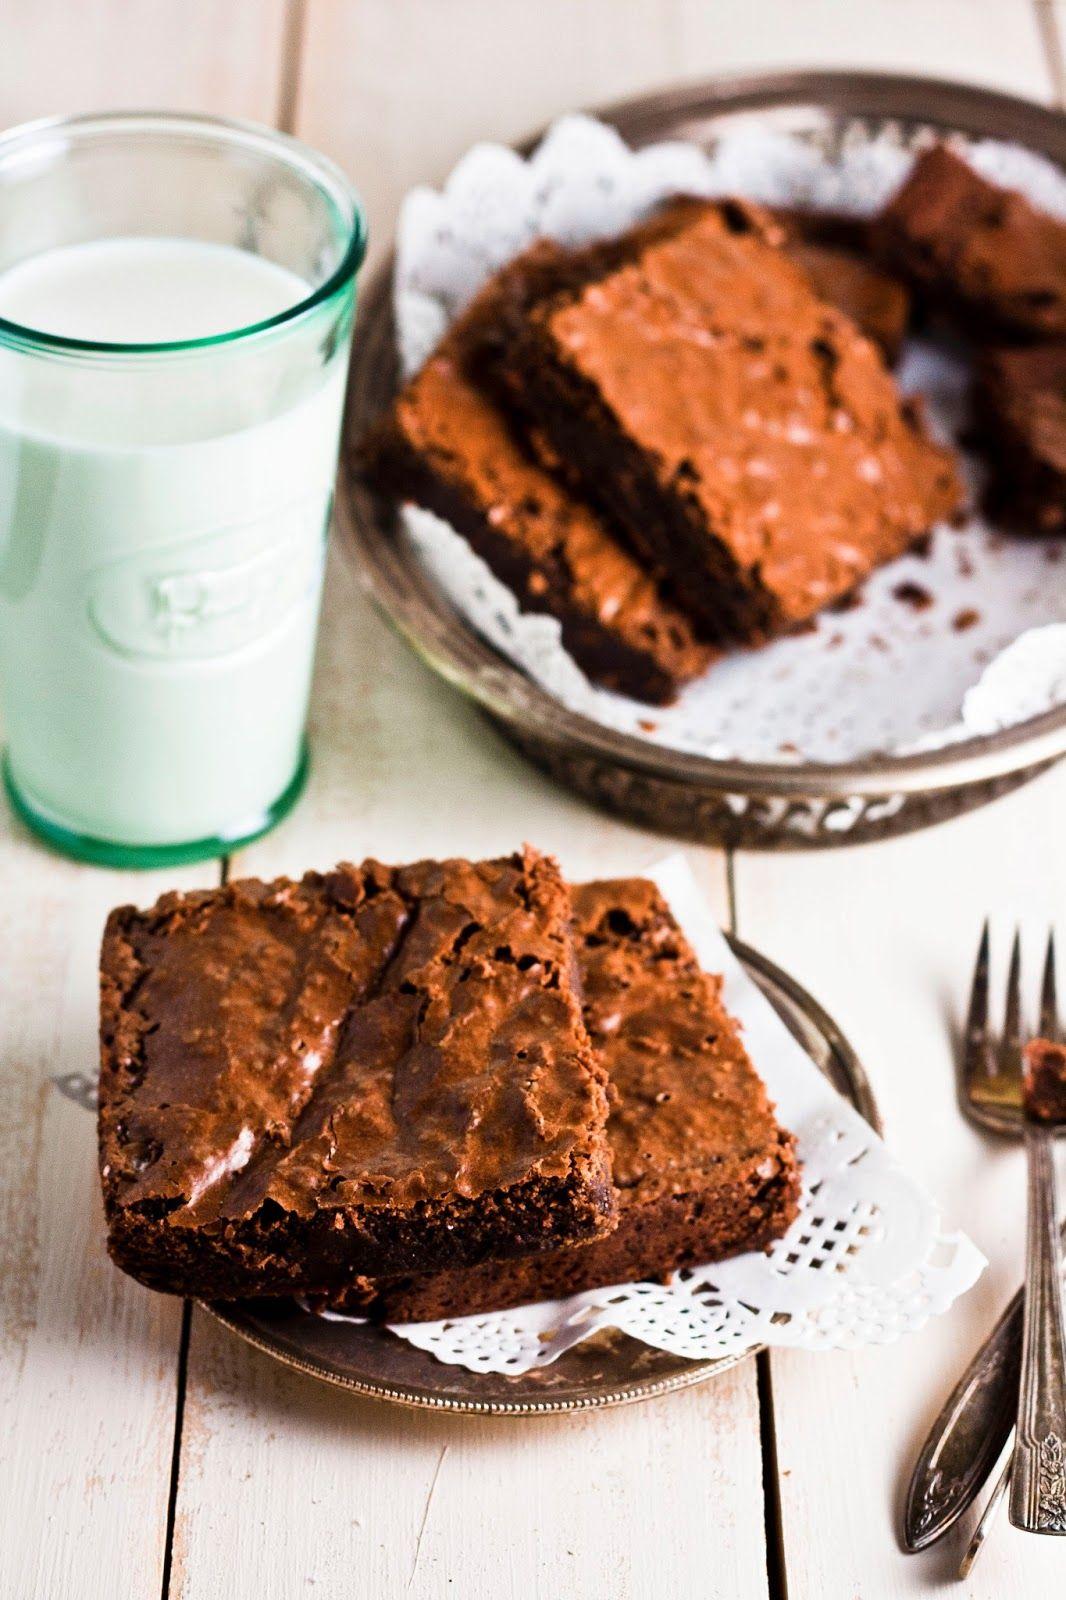 Hummingbird High - A Desserts and Baking Food Blog in Portland, Oregon: Supernatural Brownies